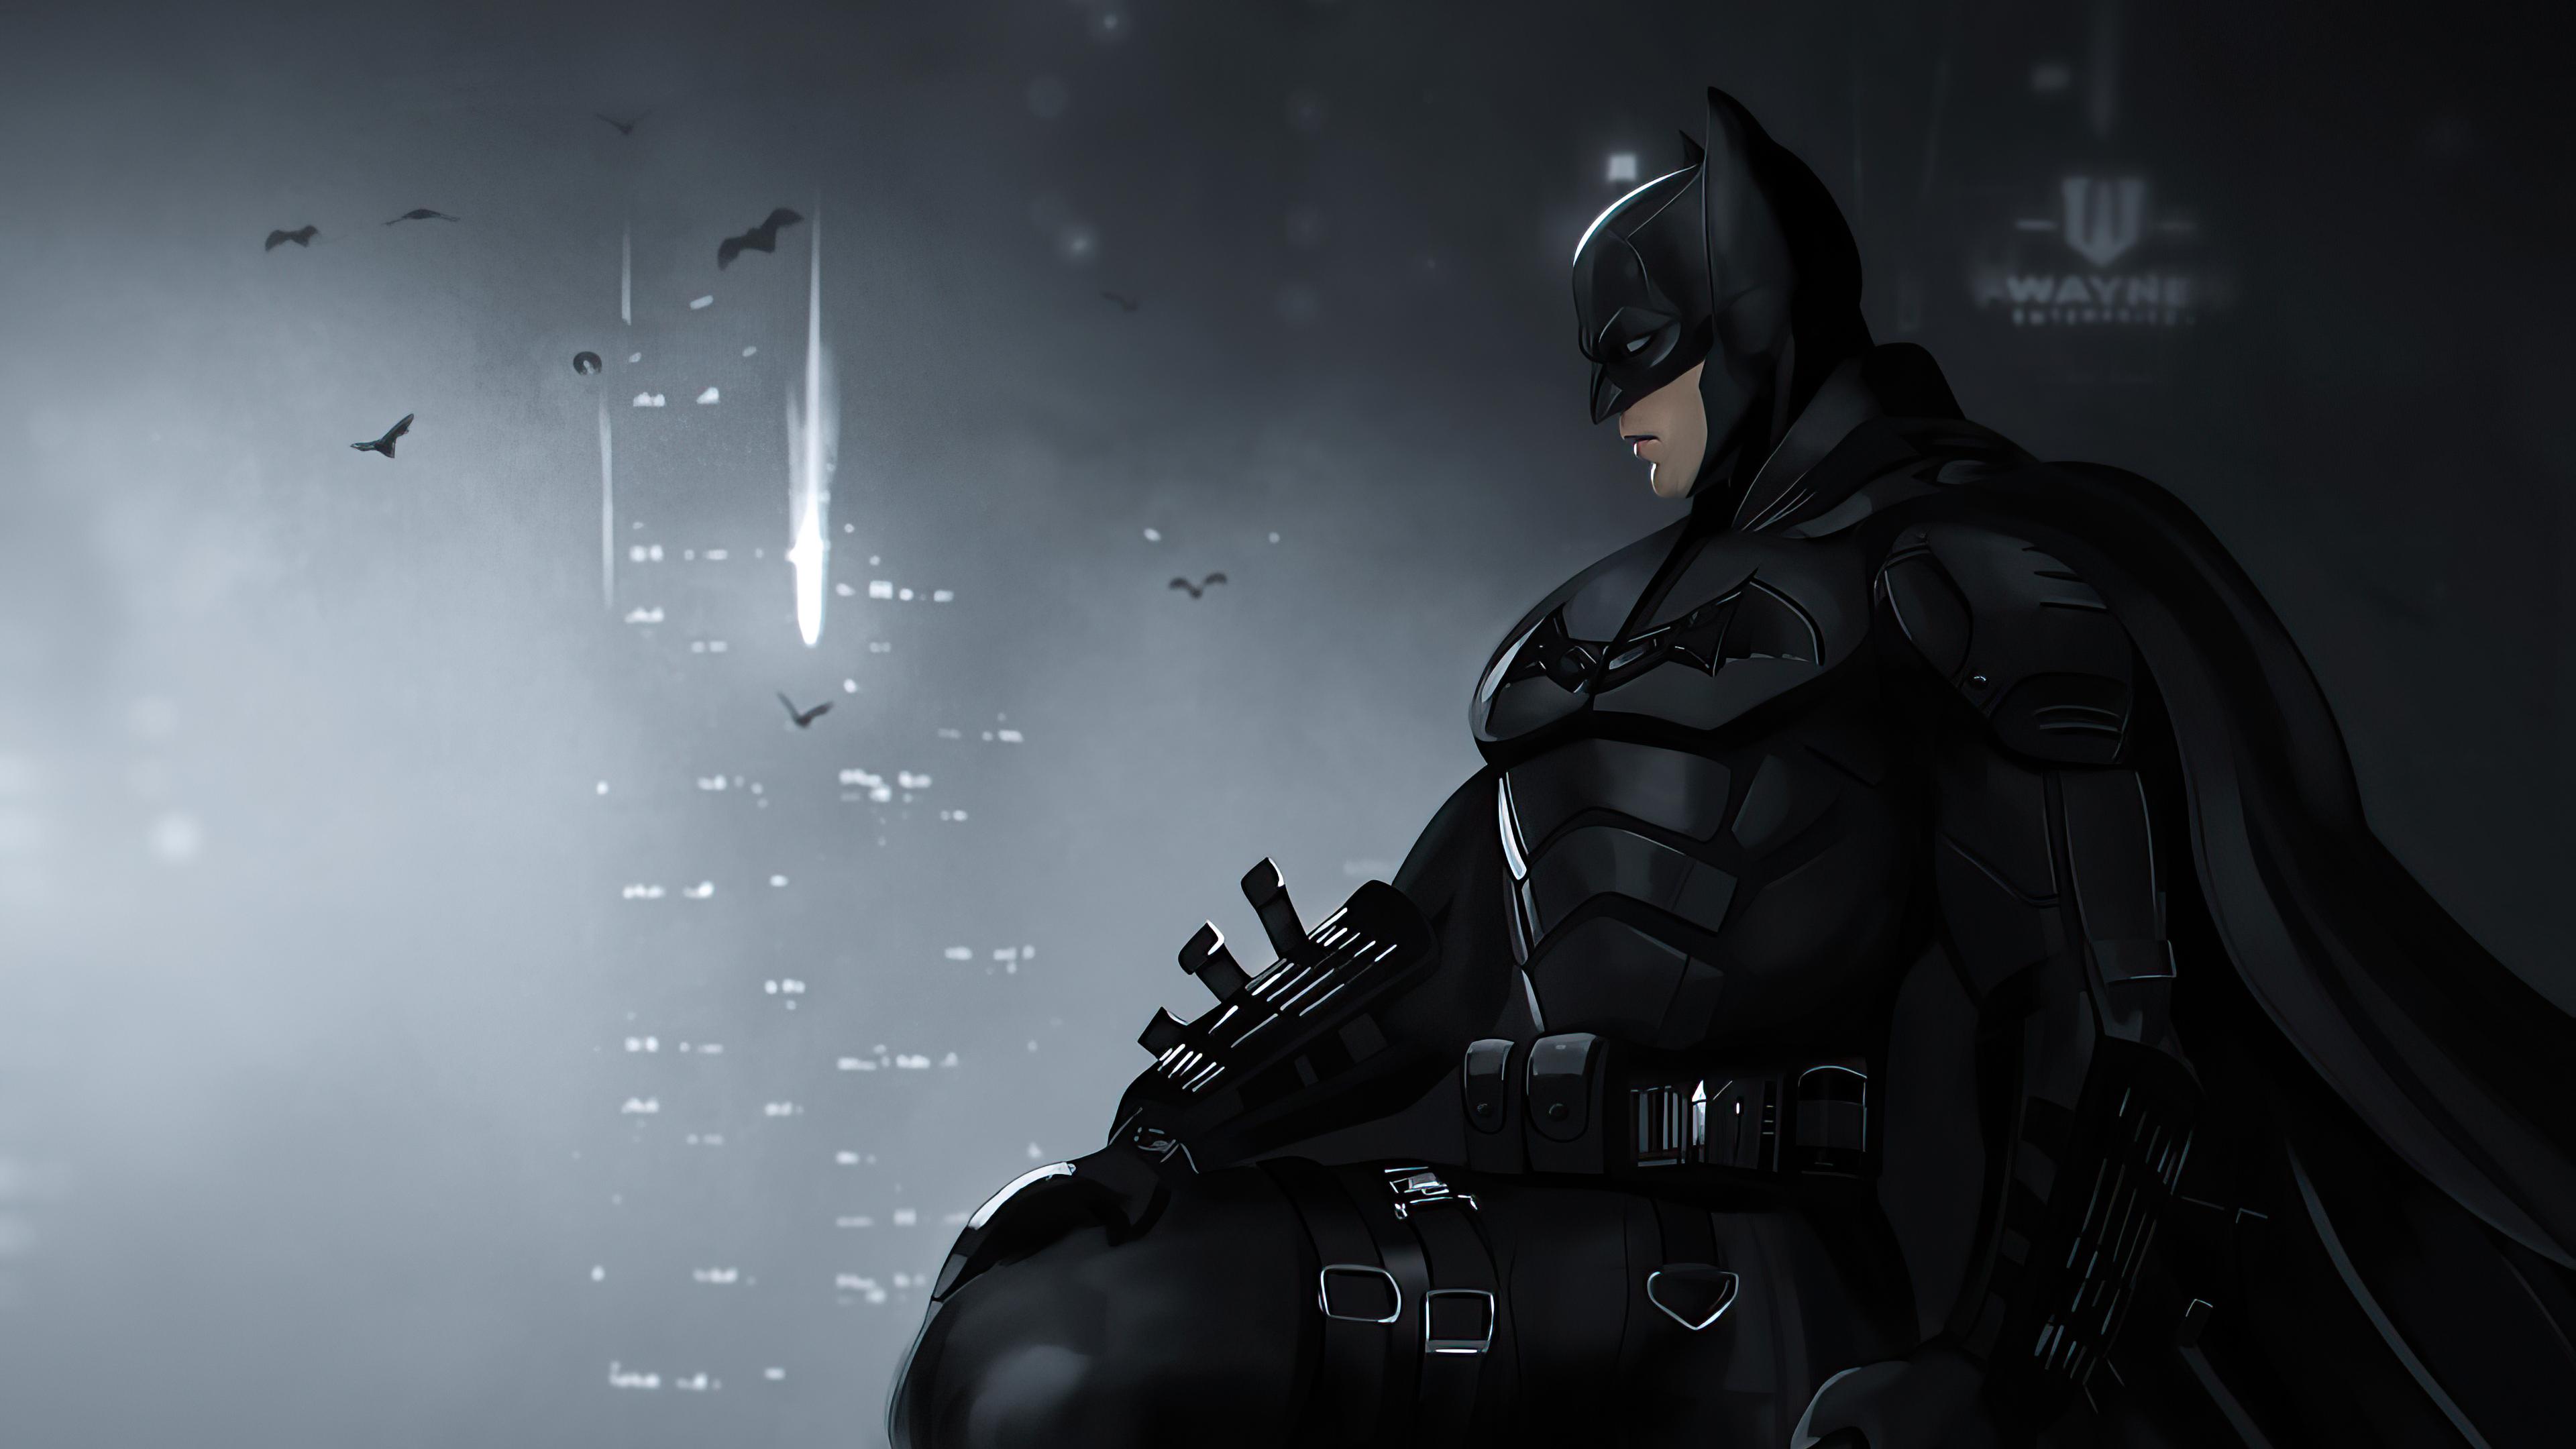 New Batman 2021 Wallpaper, HD Superheroes 4K Wallpapers ...